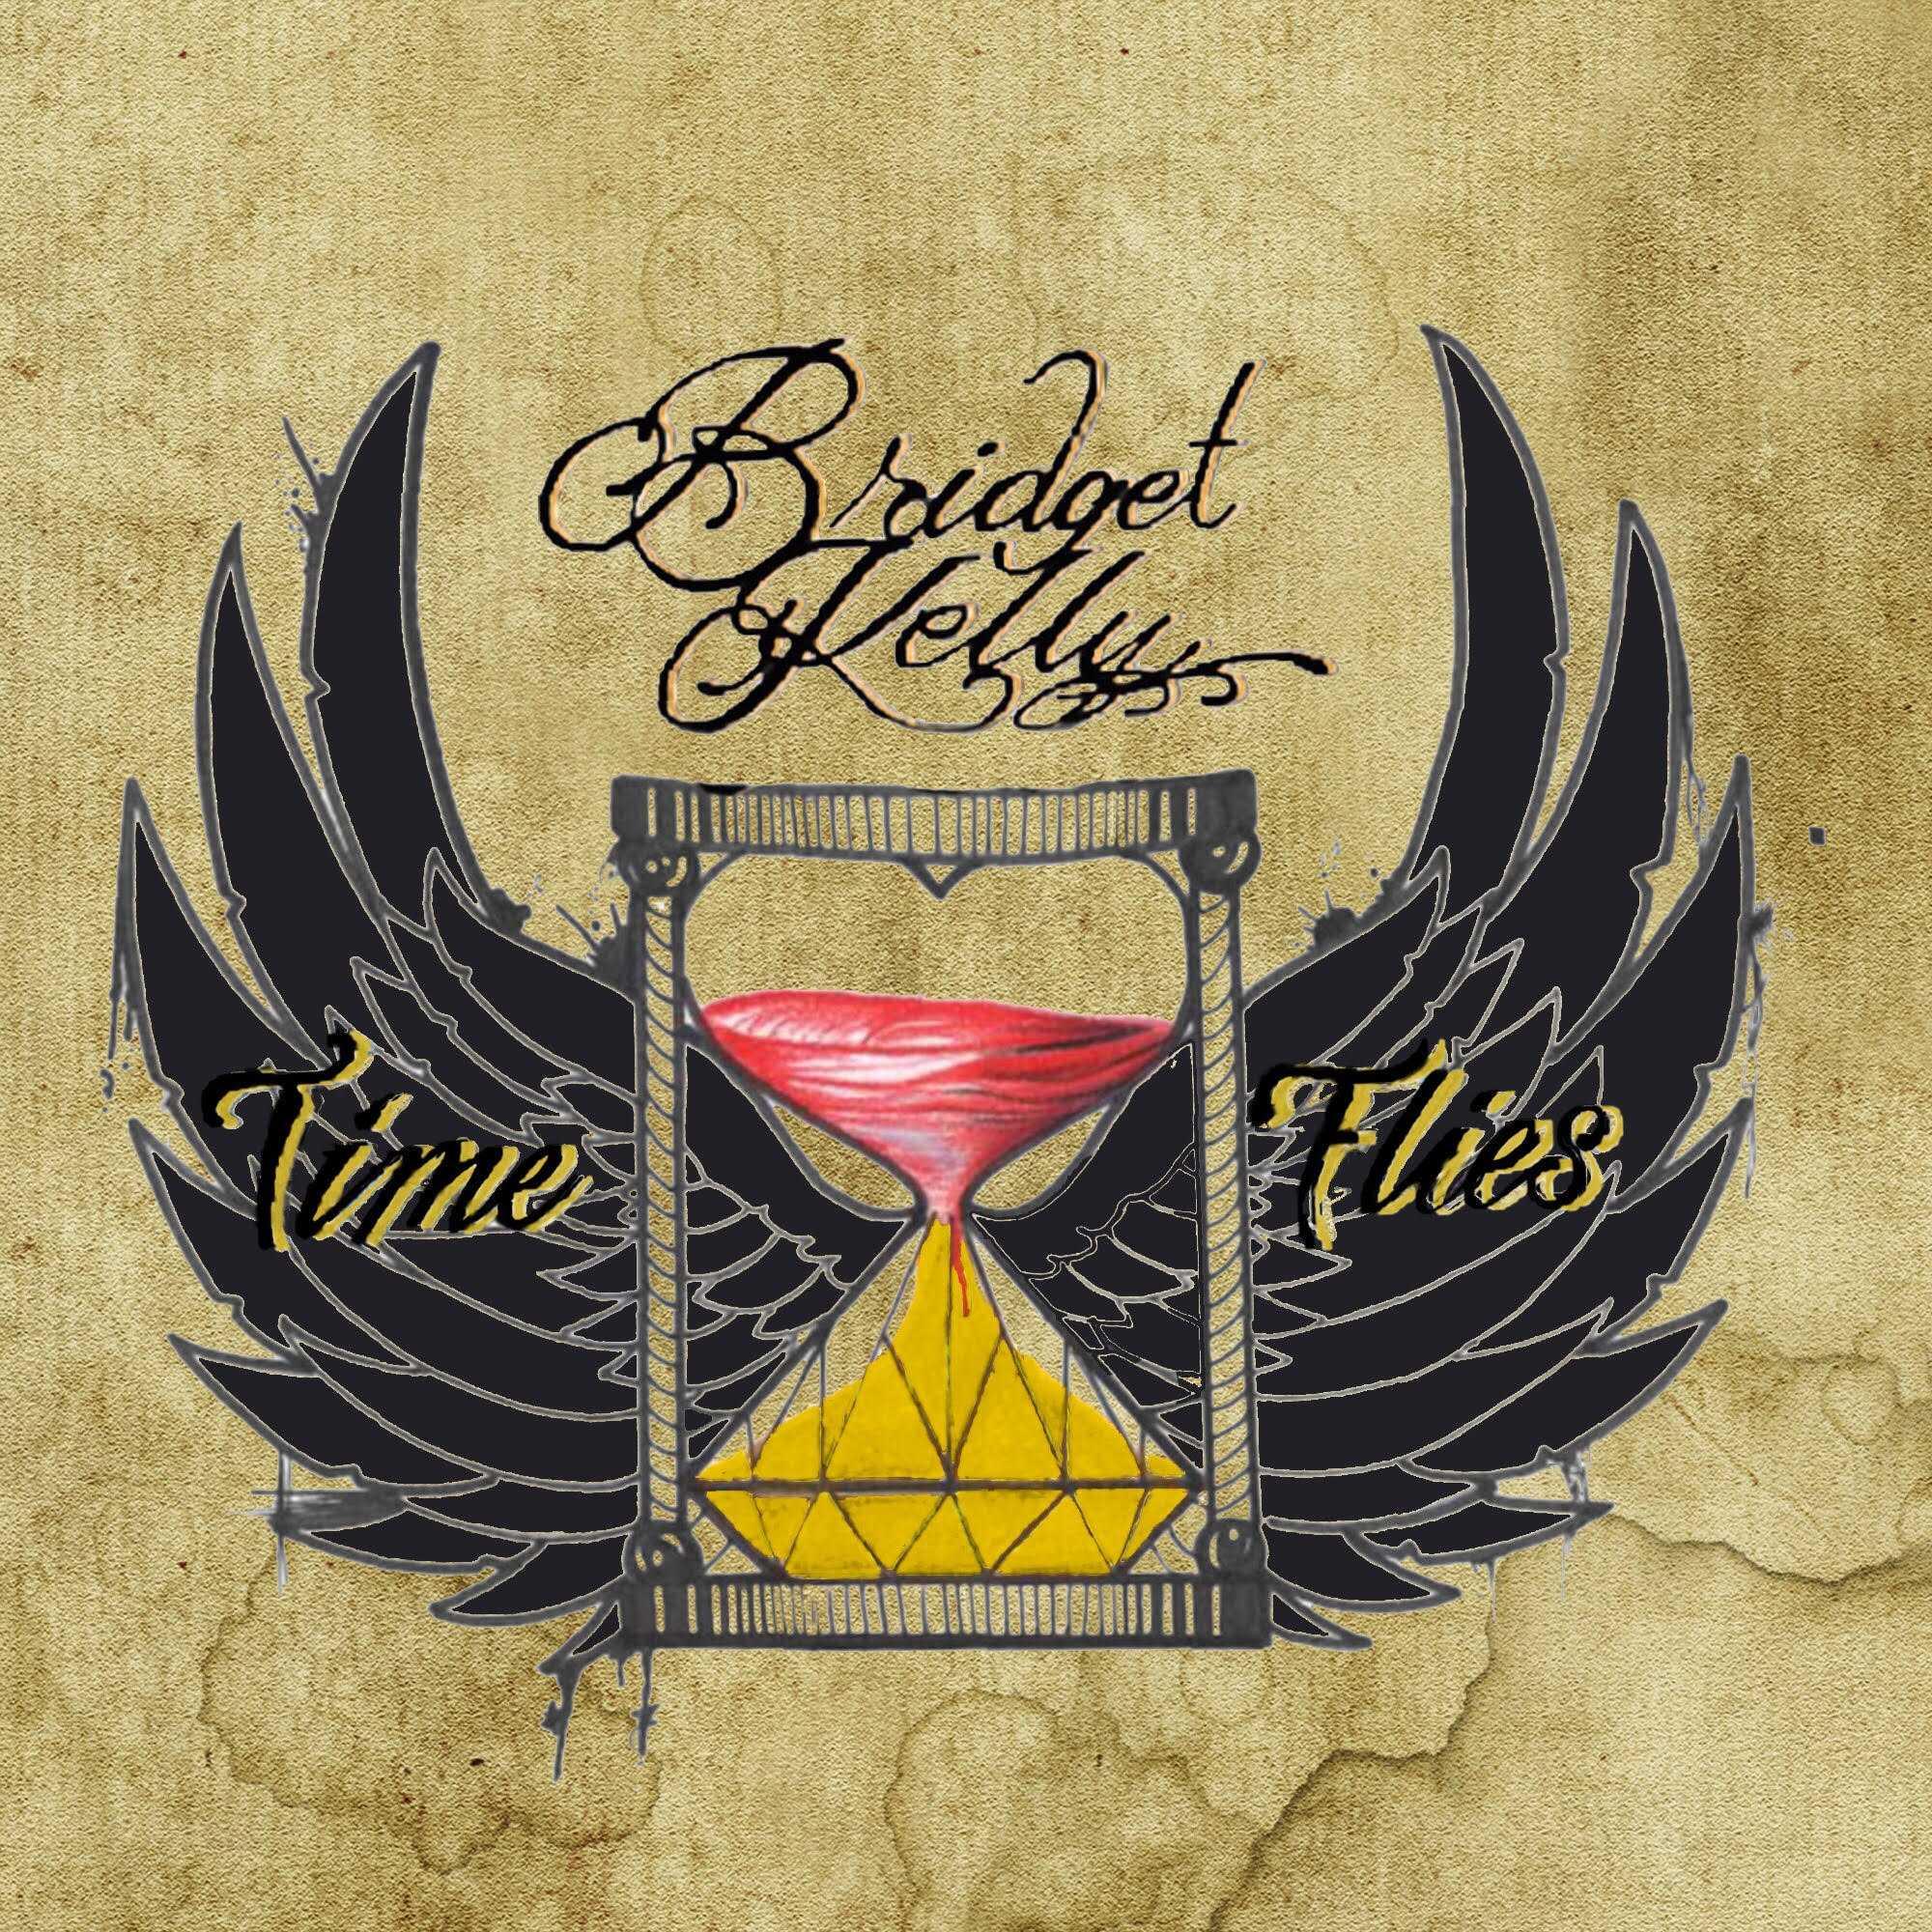 Bridget Kelly Releases Unheard Tracks on New Mixtape 'Time Flies' [Audio]